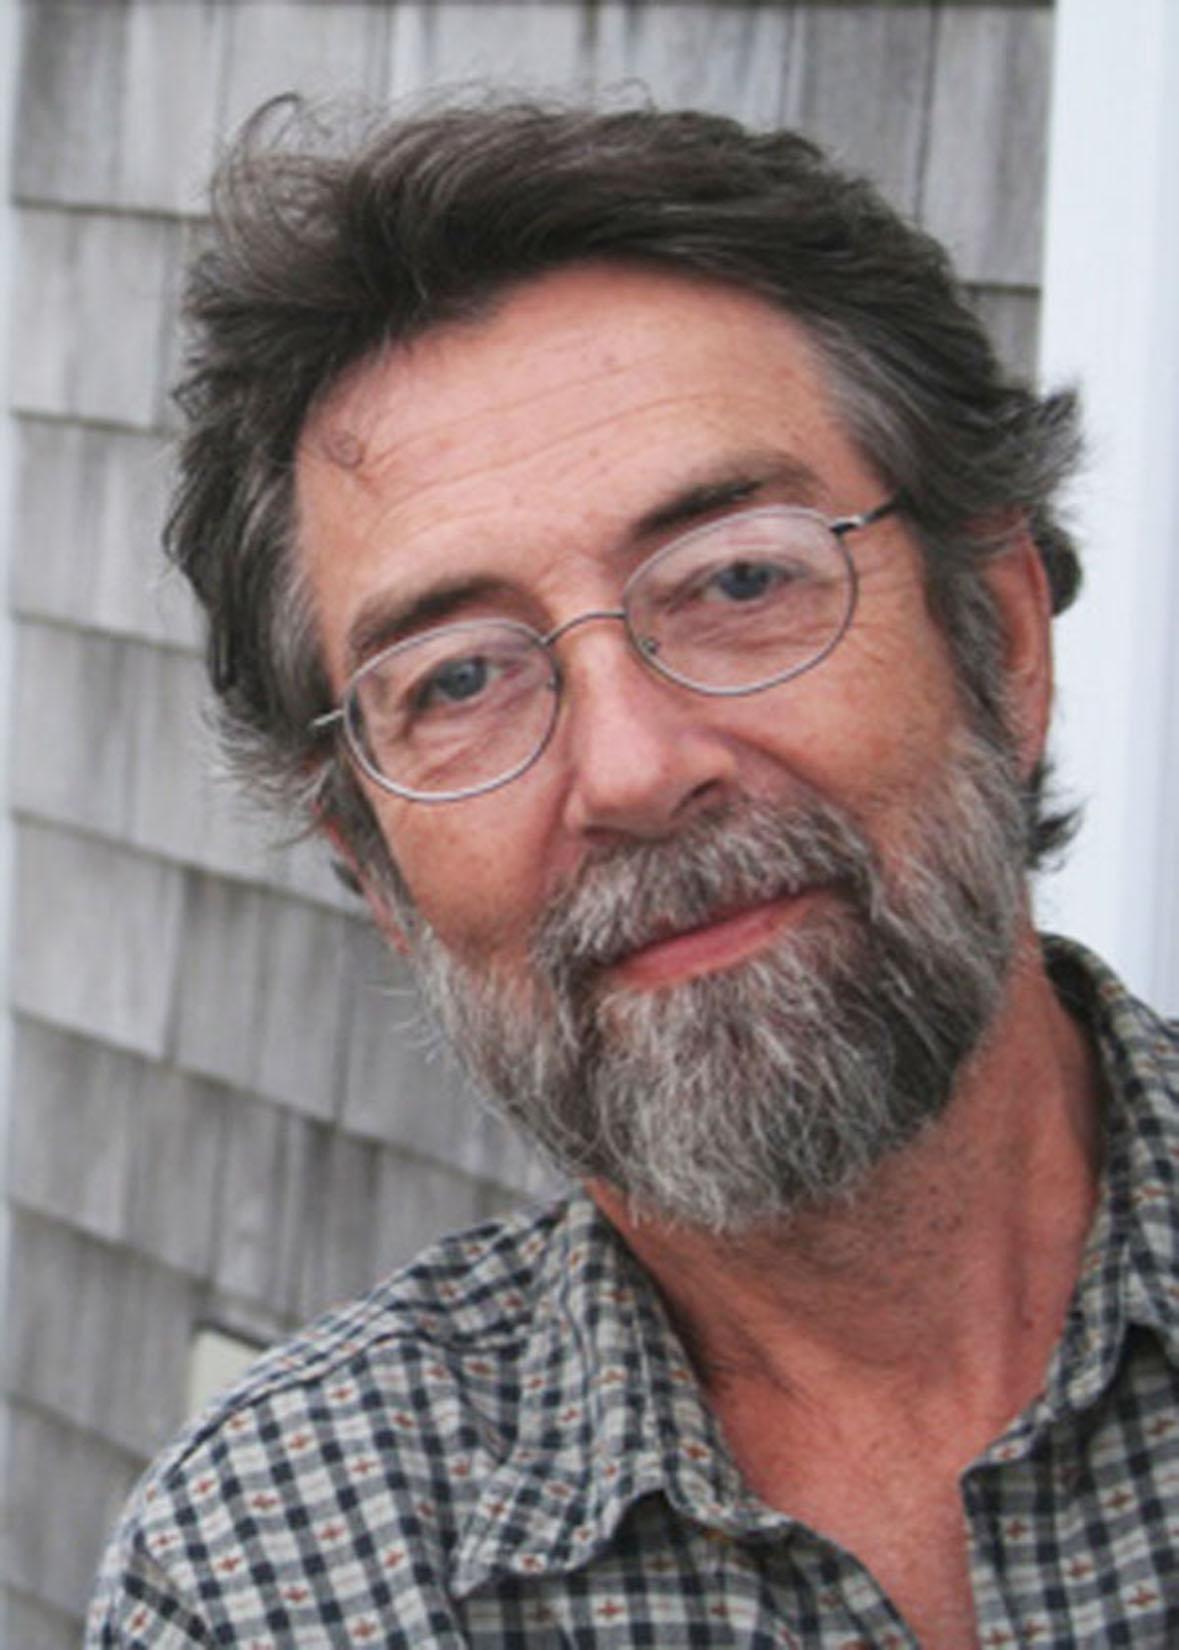 David Greenwood